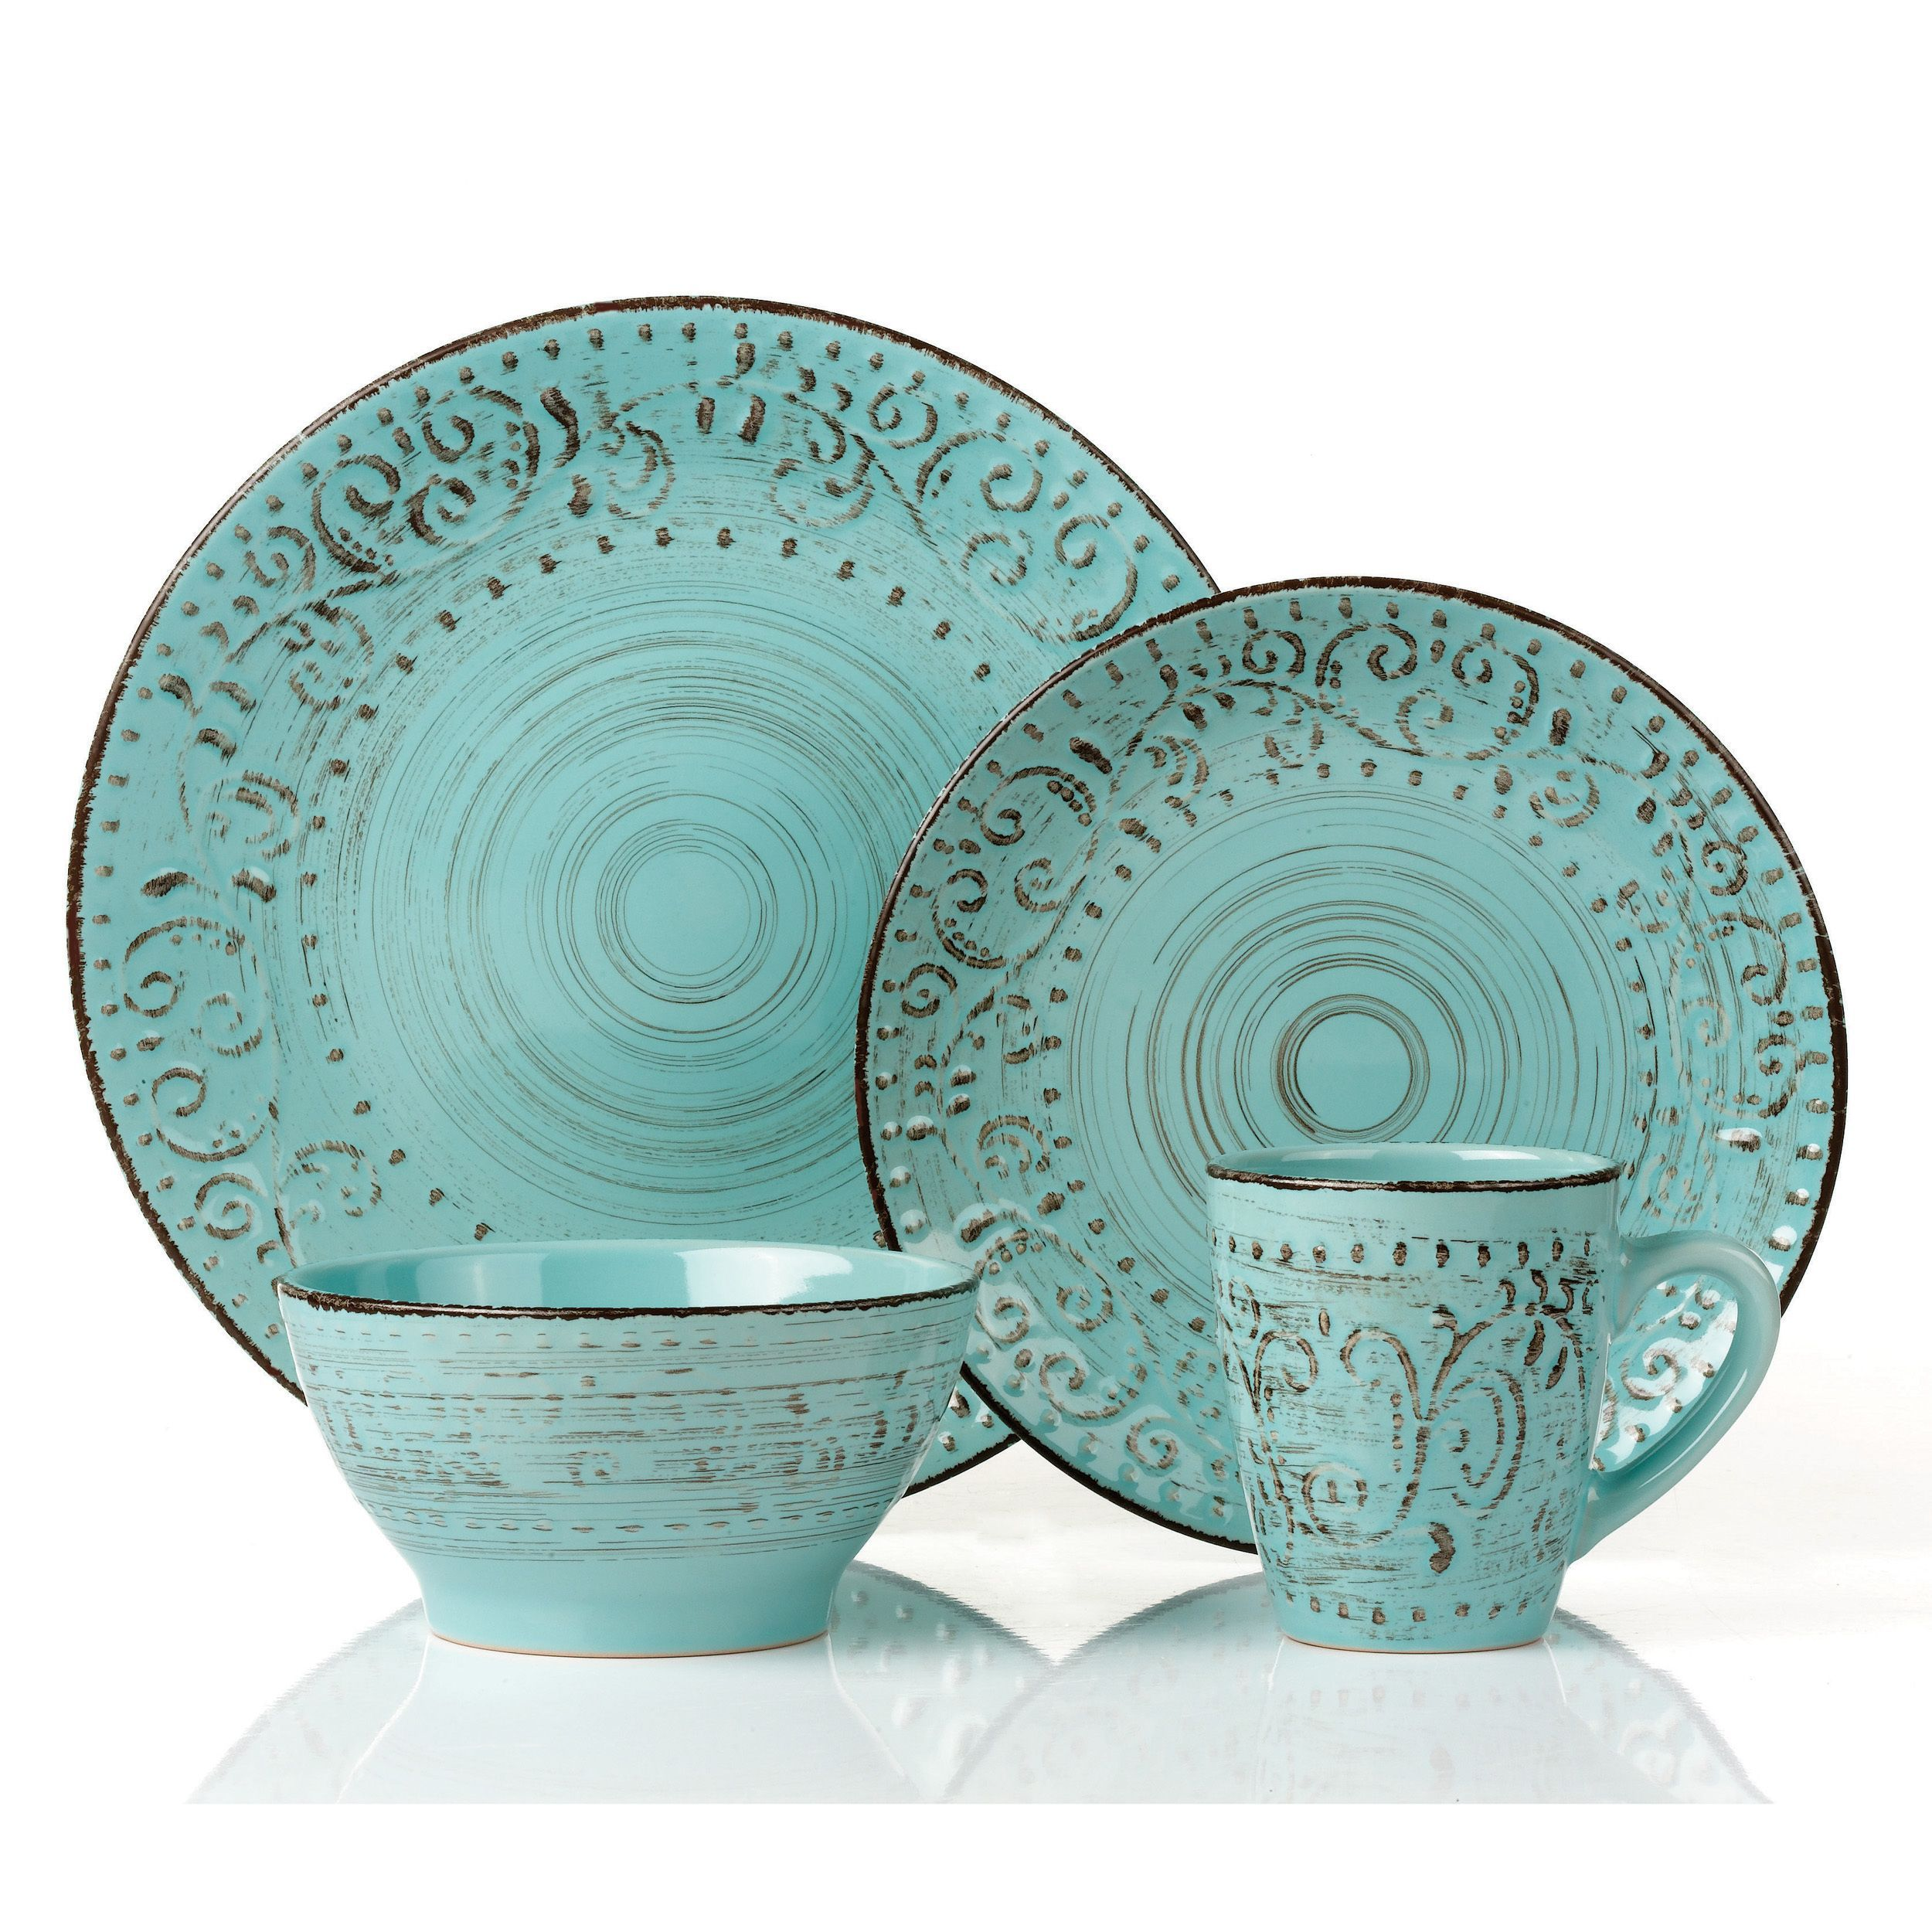 Lorren Home Trends Blue/Green Stoneware 16-piece Round Dinnerware Set | Overstock.com Shopping - The Best Deals on Casual Dinnerware  sc 1 st  Pinterest & Lorren Home Trends Blue/Green Stoneware 16-piece Round Dinnerware ...